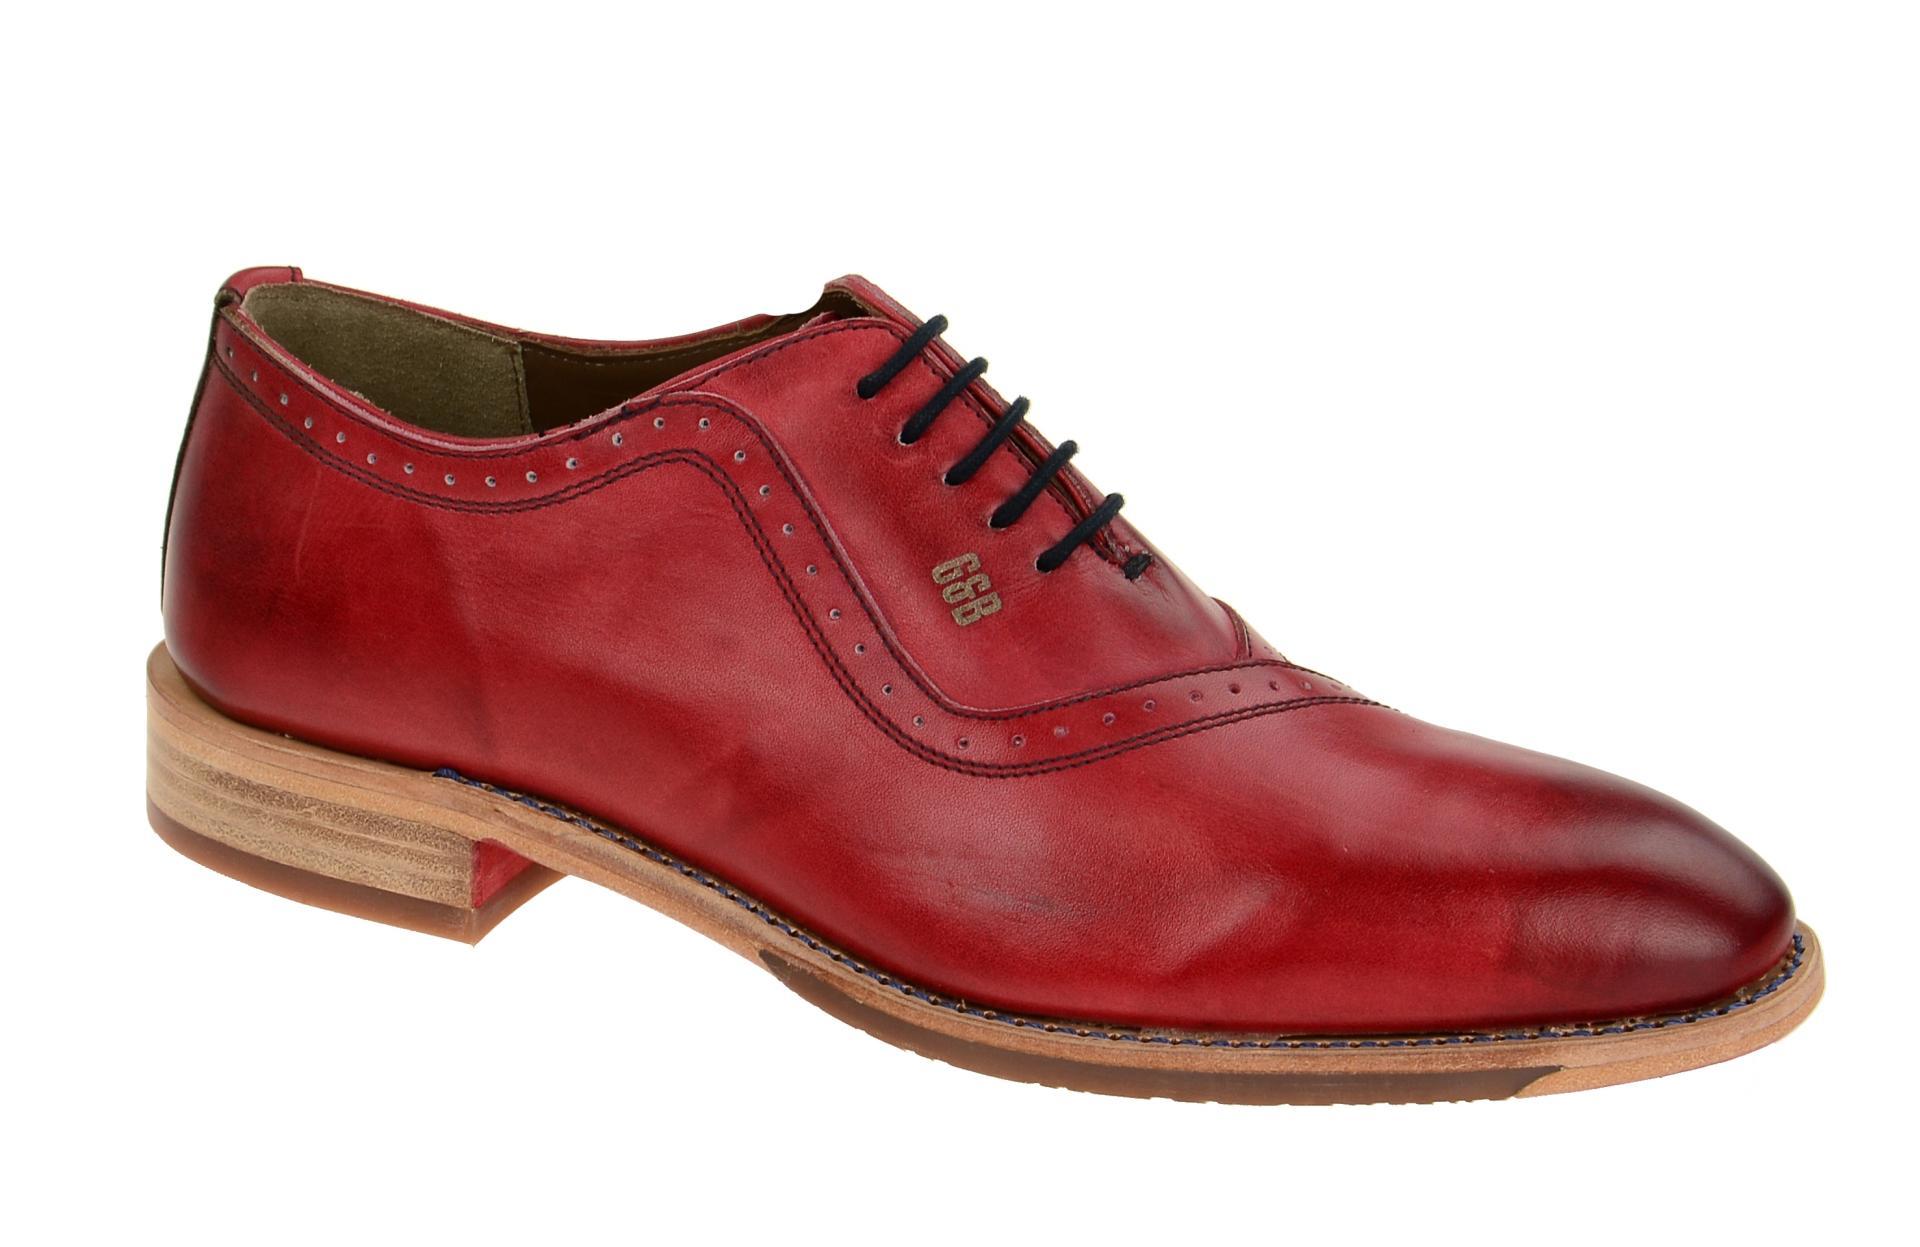 gordon bros schuhe mirco rot herrenschuhe elegante halbschuhe s160744 red ebay. Black Bedroom Furniture Sets. Home Design Ideas